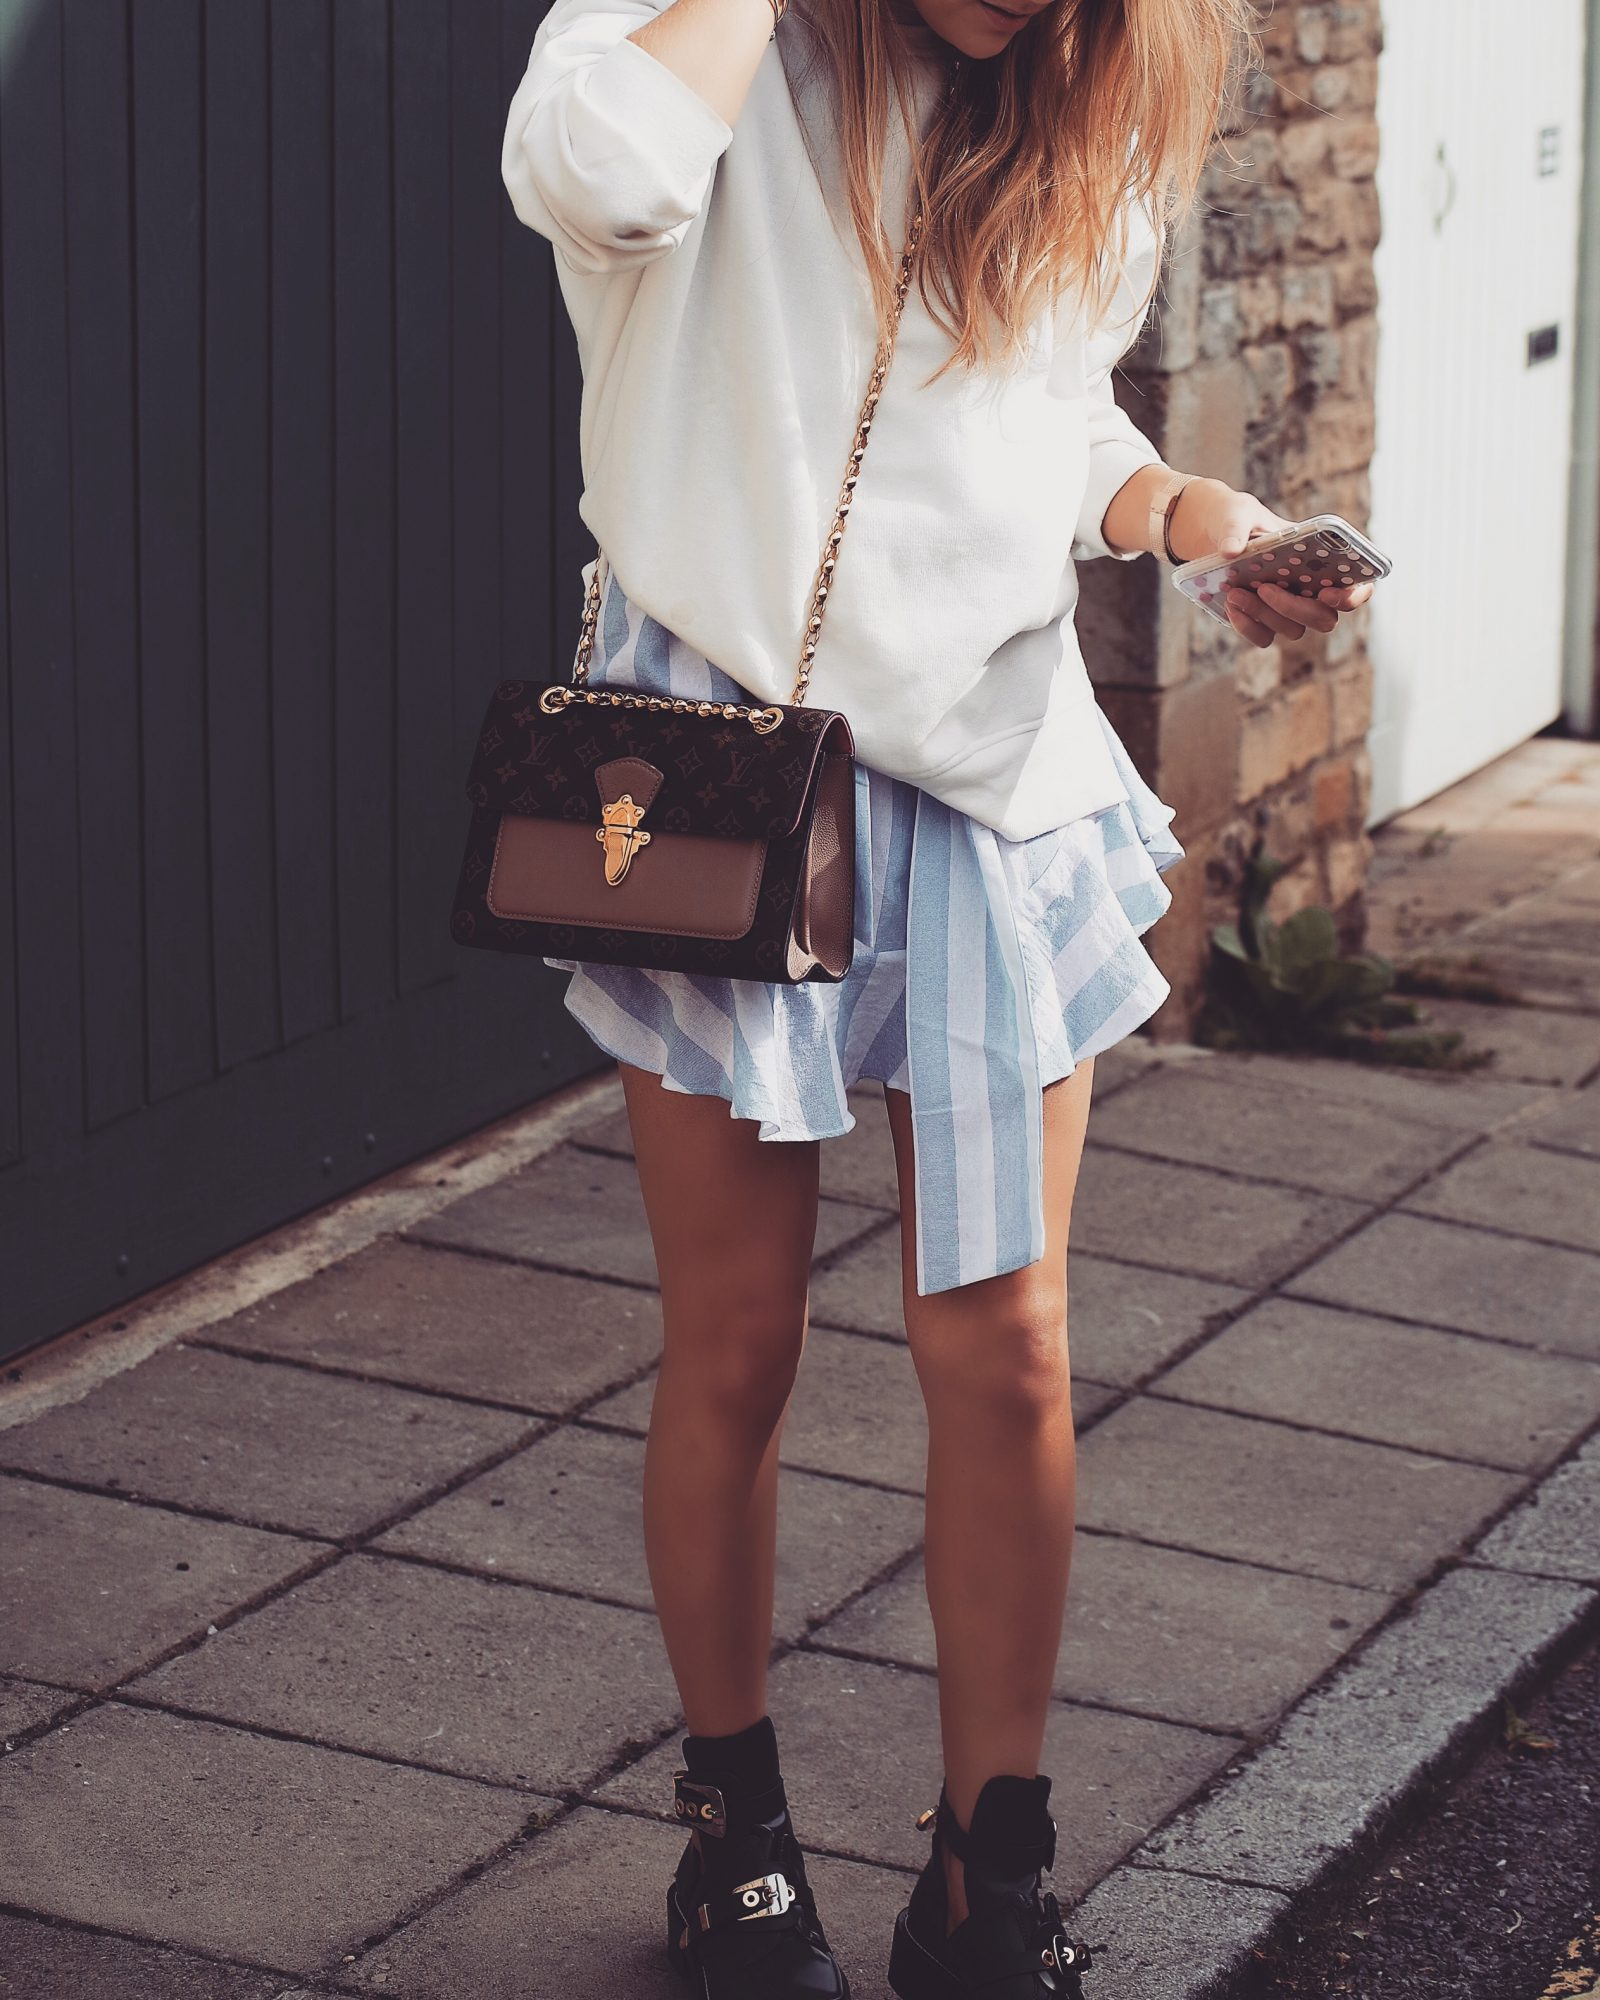 Real Time Haul - White Sweatshirt, Fashion Blogger